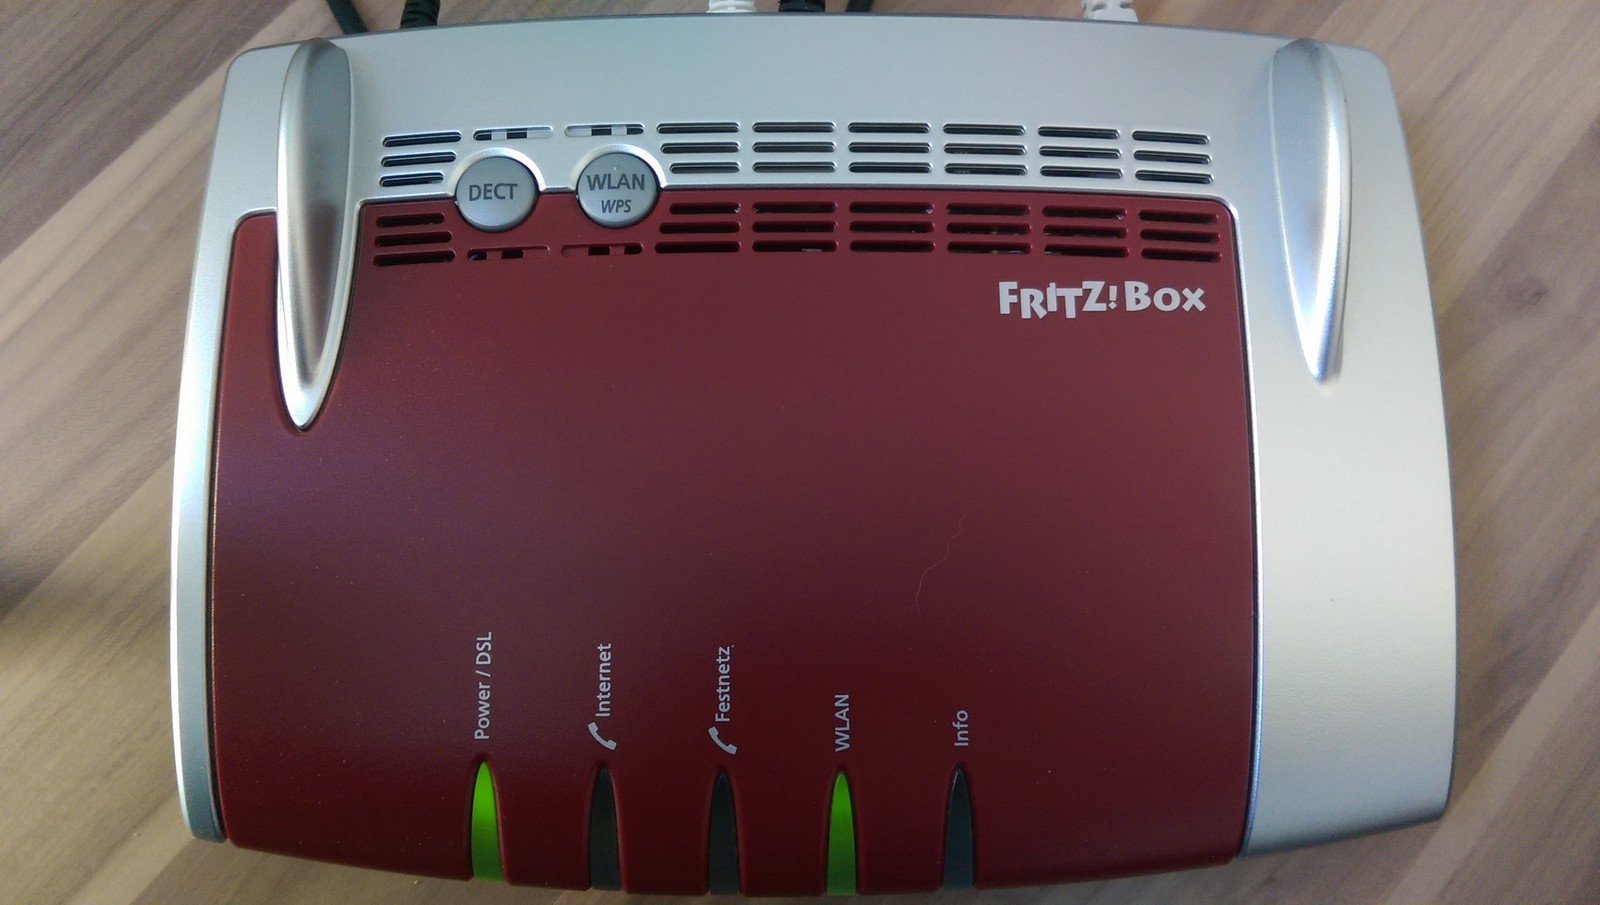 avm homebox fritzbox 7490 lieferprobleme und rger mit. Black Bedroom Furniture Sets. Home Design Ideas